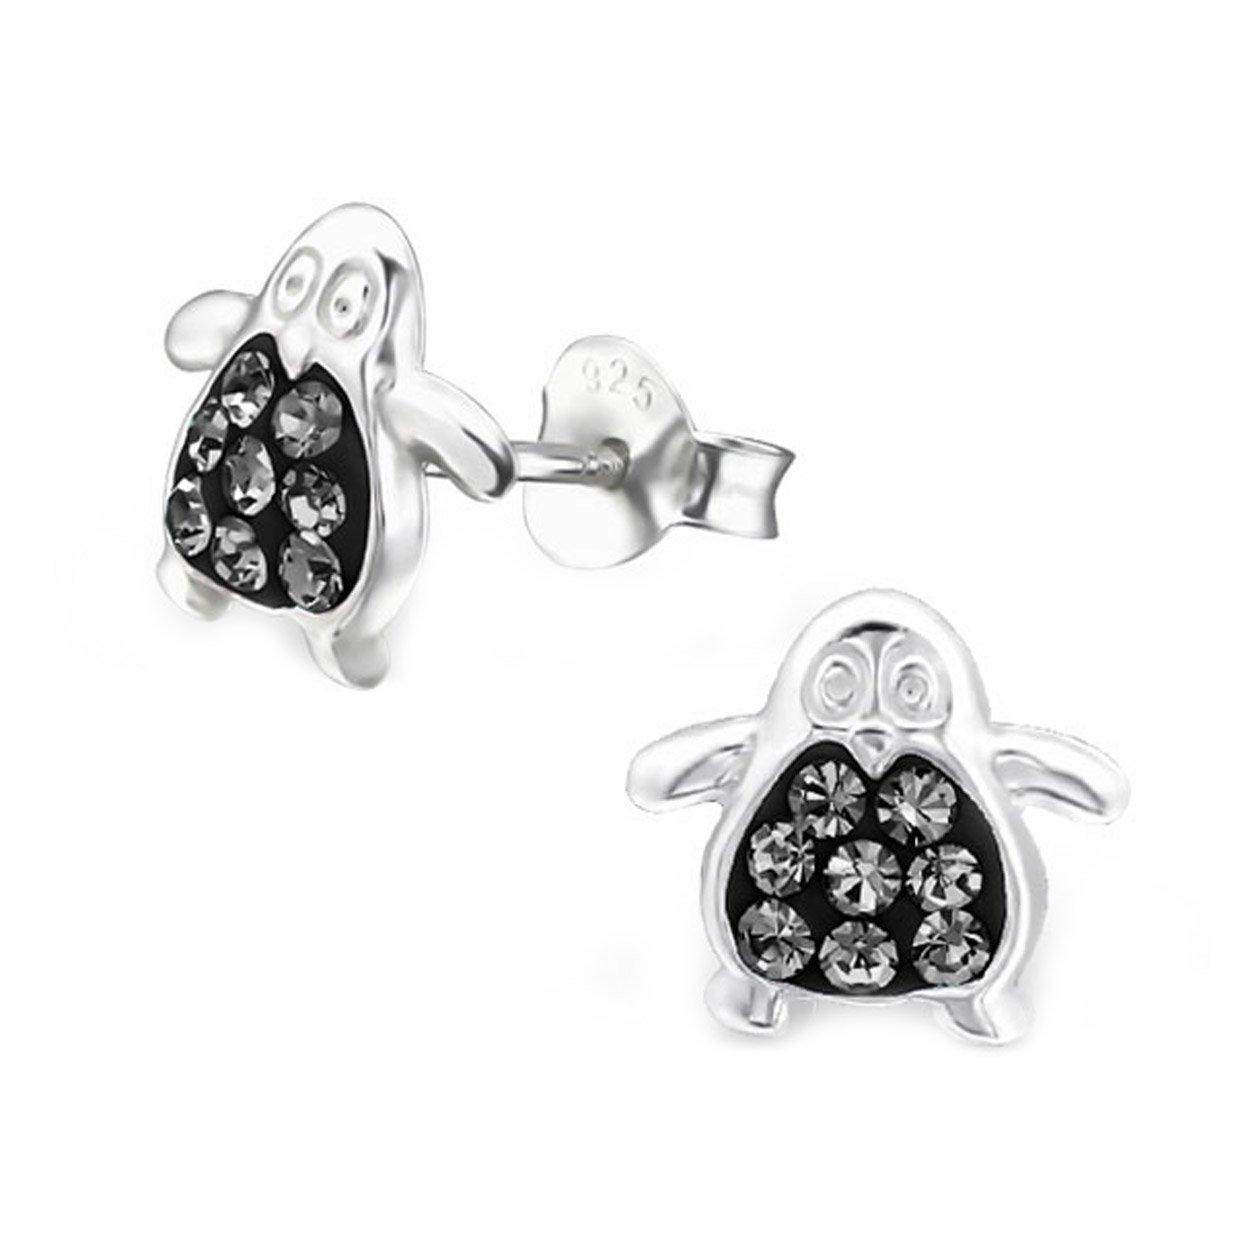 Cute Crystals Penguin Earrings Studs Girls Sterling Silver 925 (E5420) (Black Diamond)